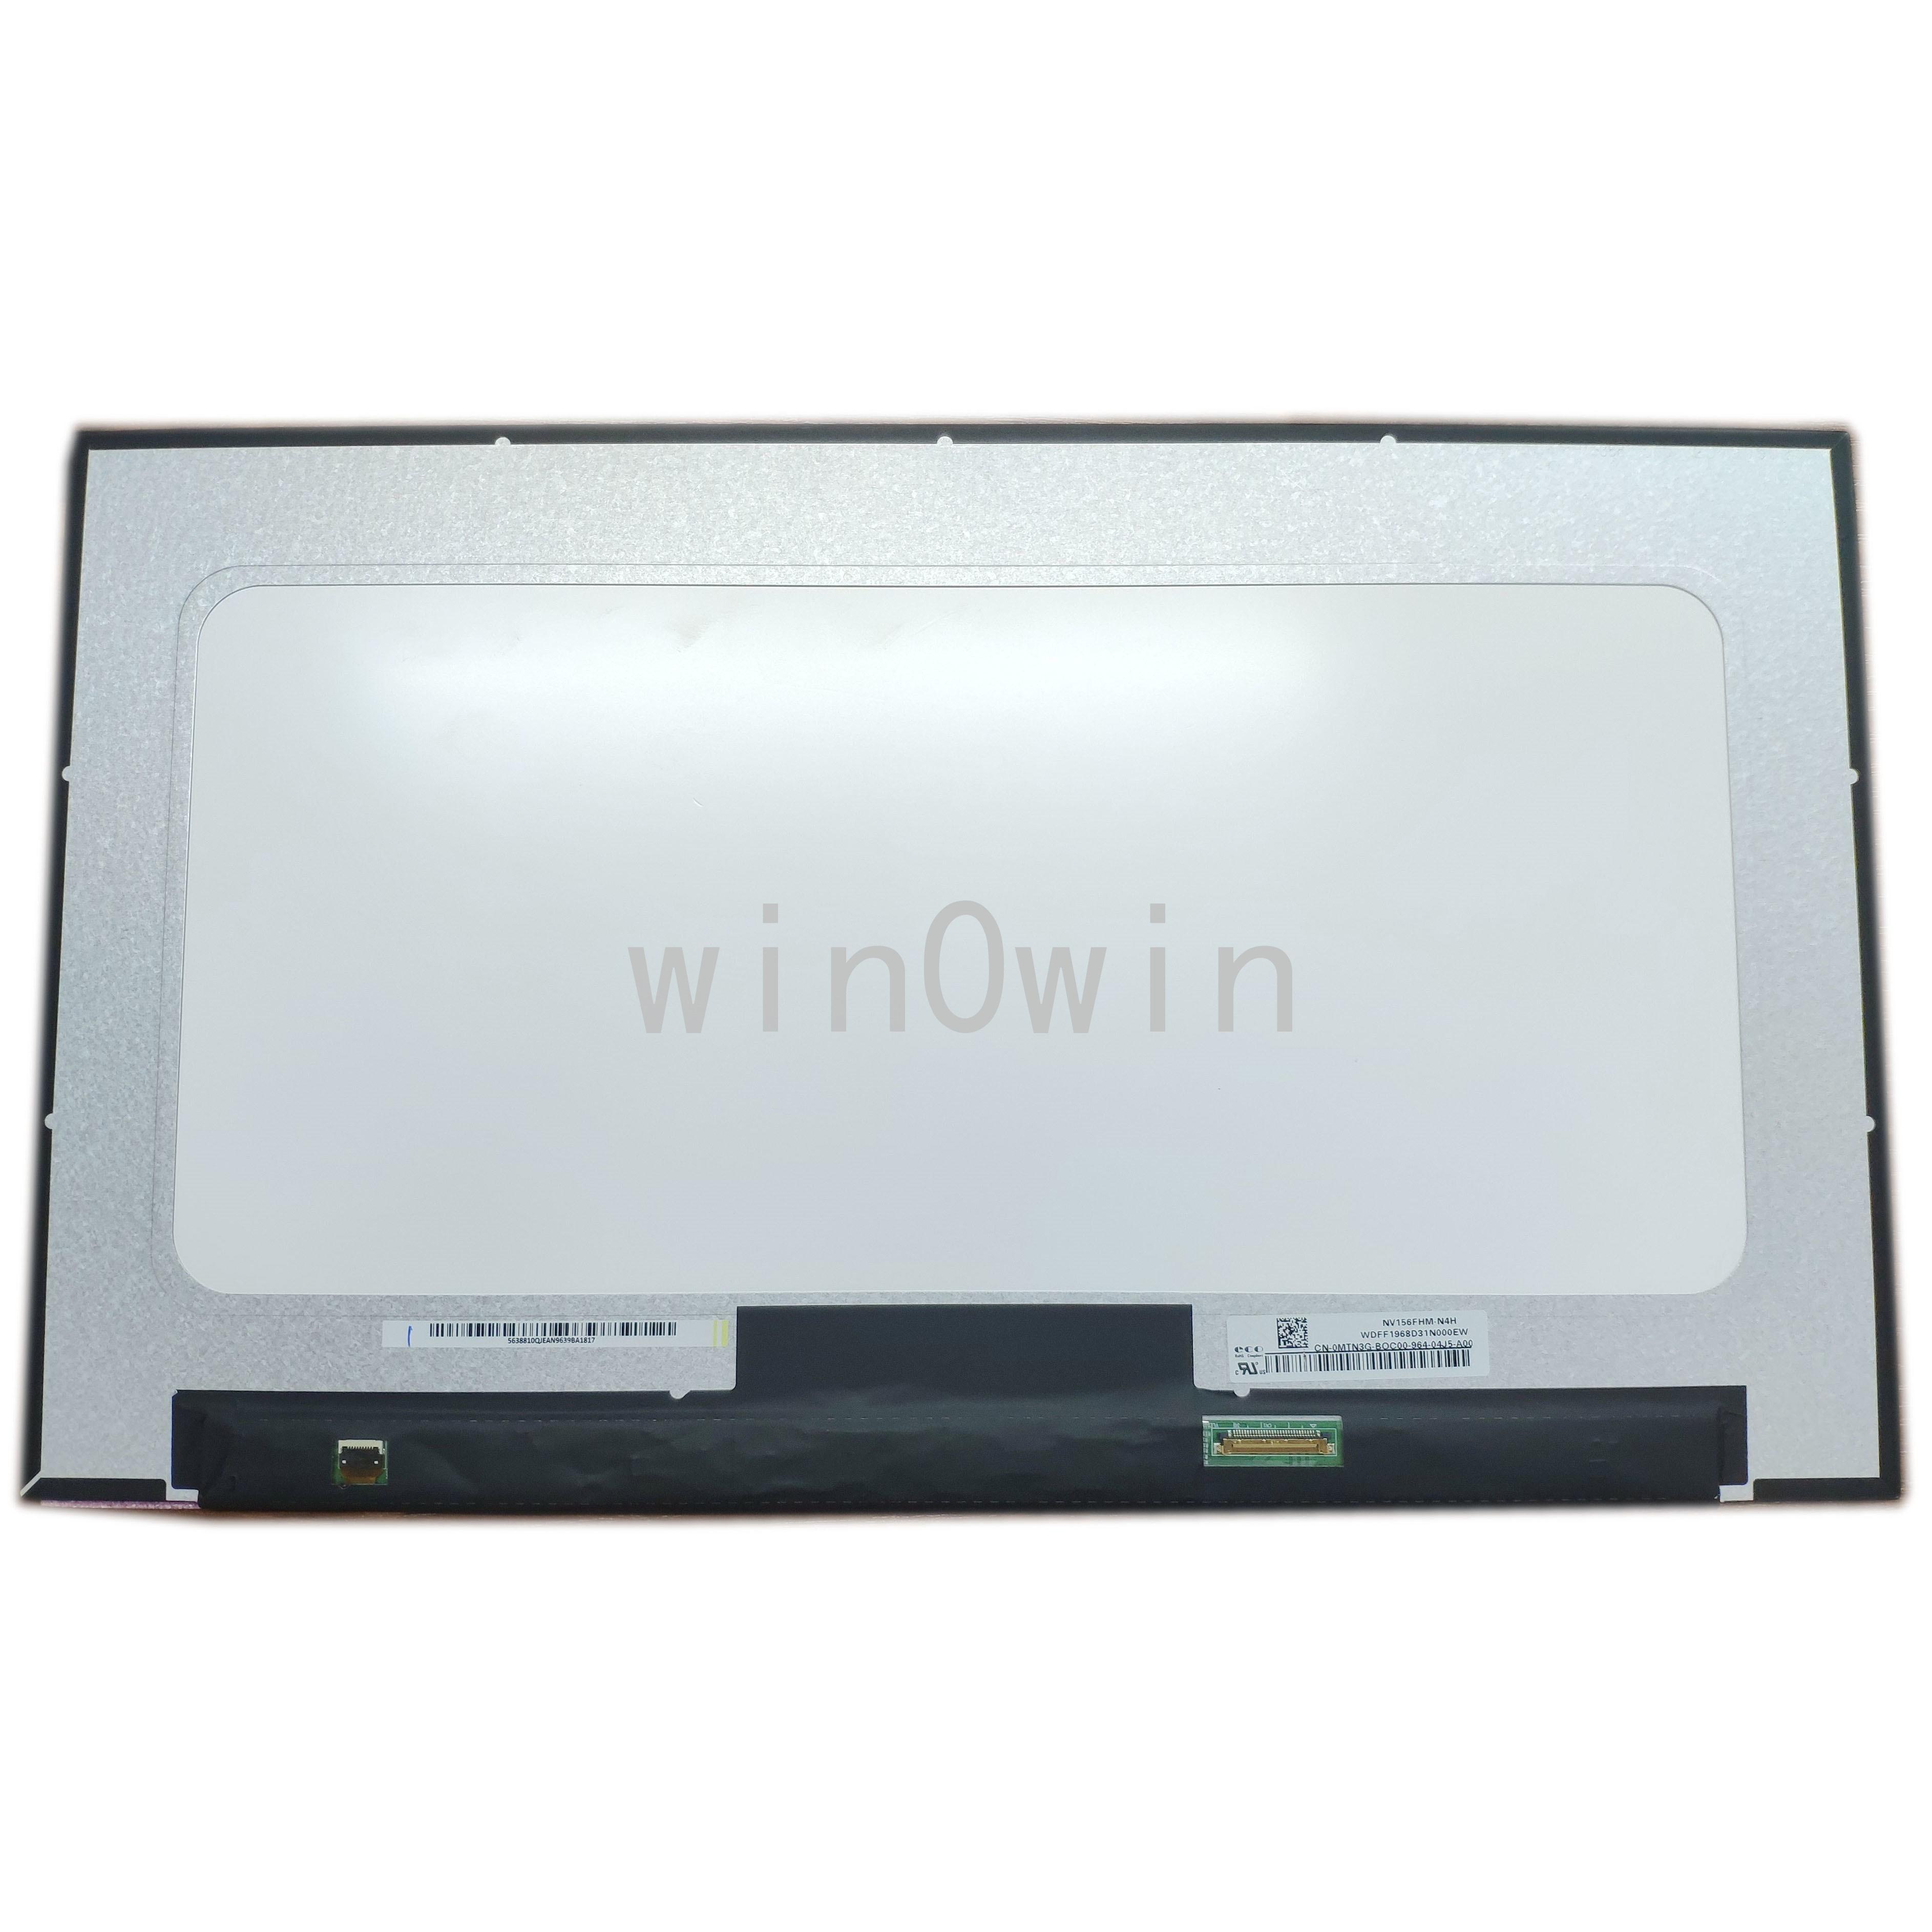 NV156FHM-N4H Fit NV156FHM-N4N V8.0 NV156FHM-N52 NV156FHM-N4L LP156WFC SPM1 B156HAN02.5 1920x1080 IPS EDP LCD SCREEN Panel Matrix